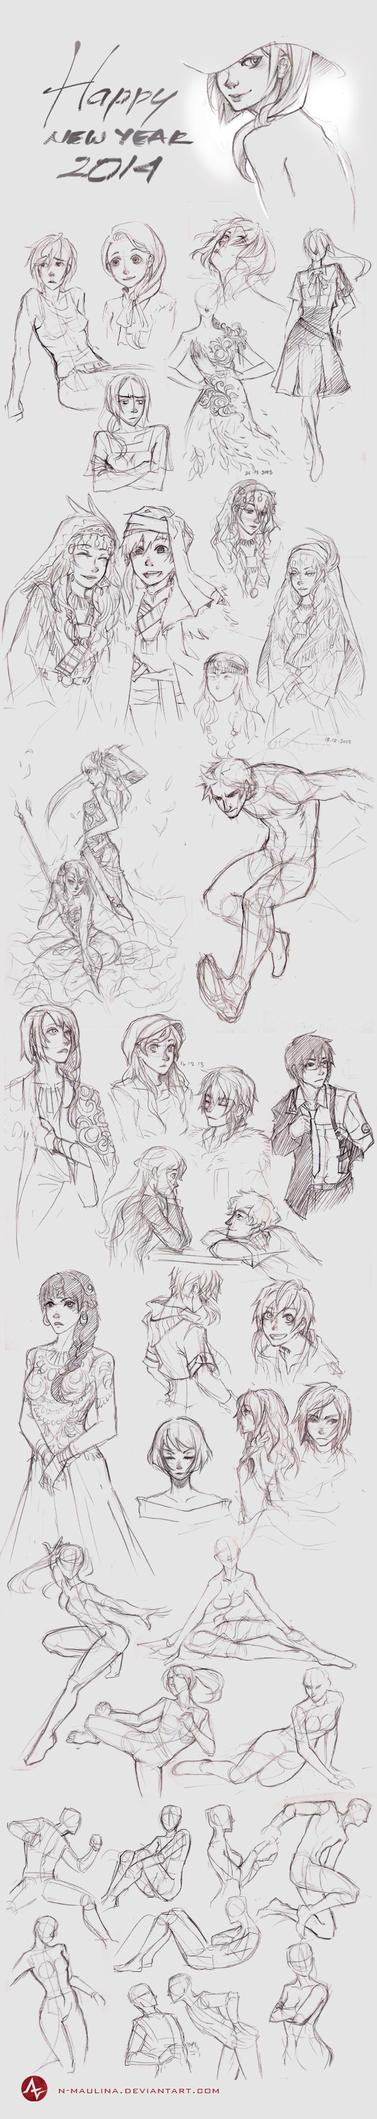 Sketchbook - Dec 2013 by N-Maulina